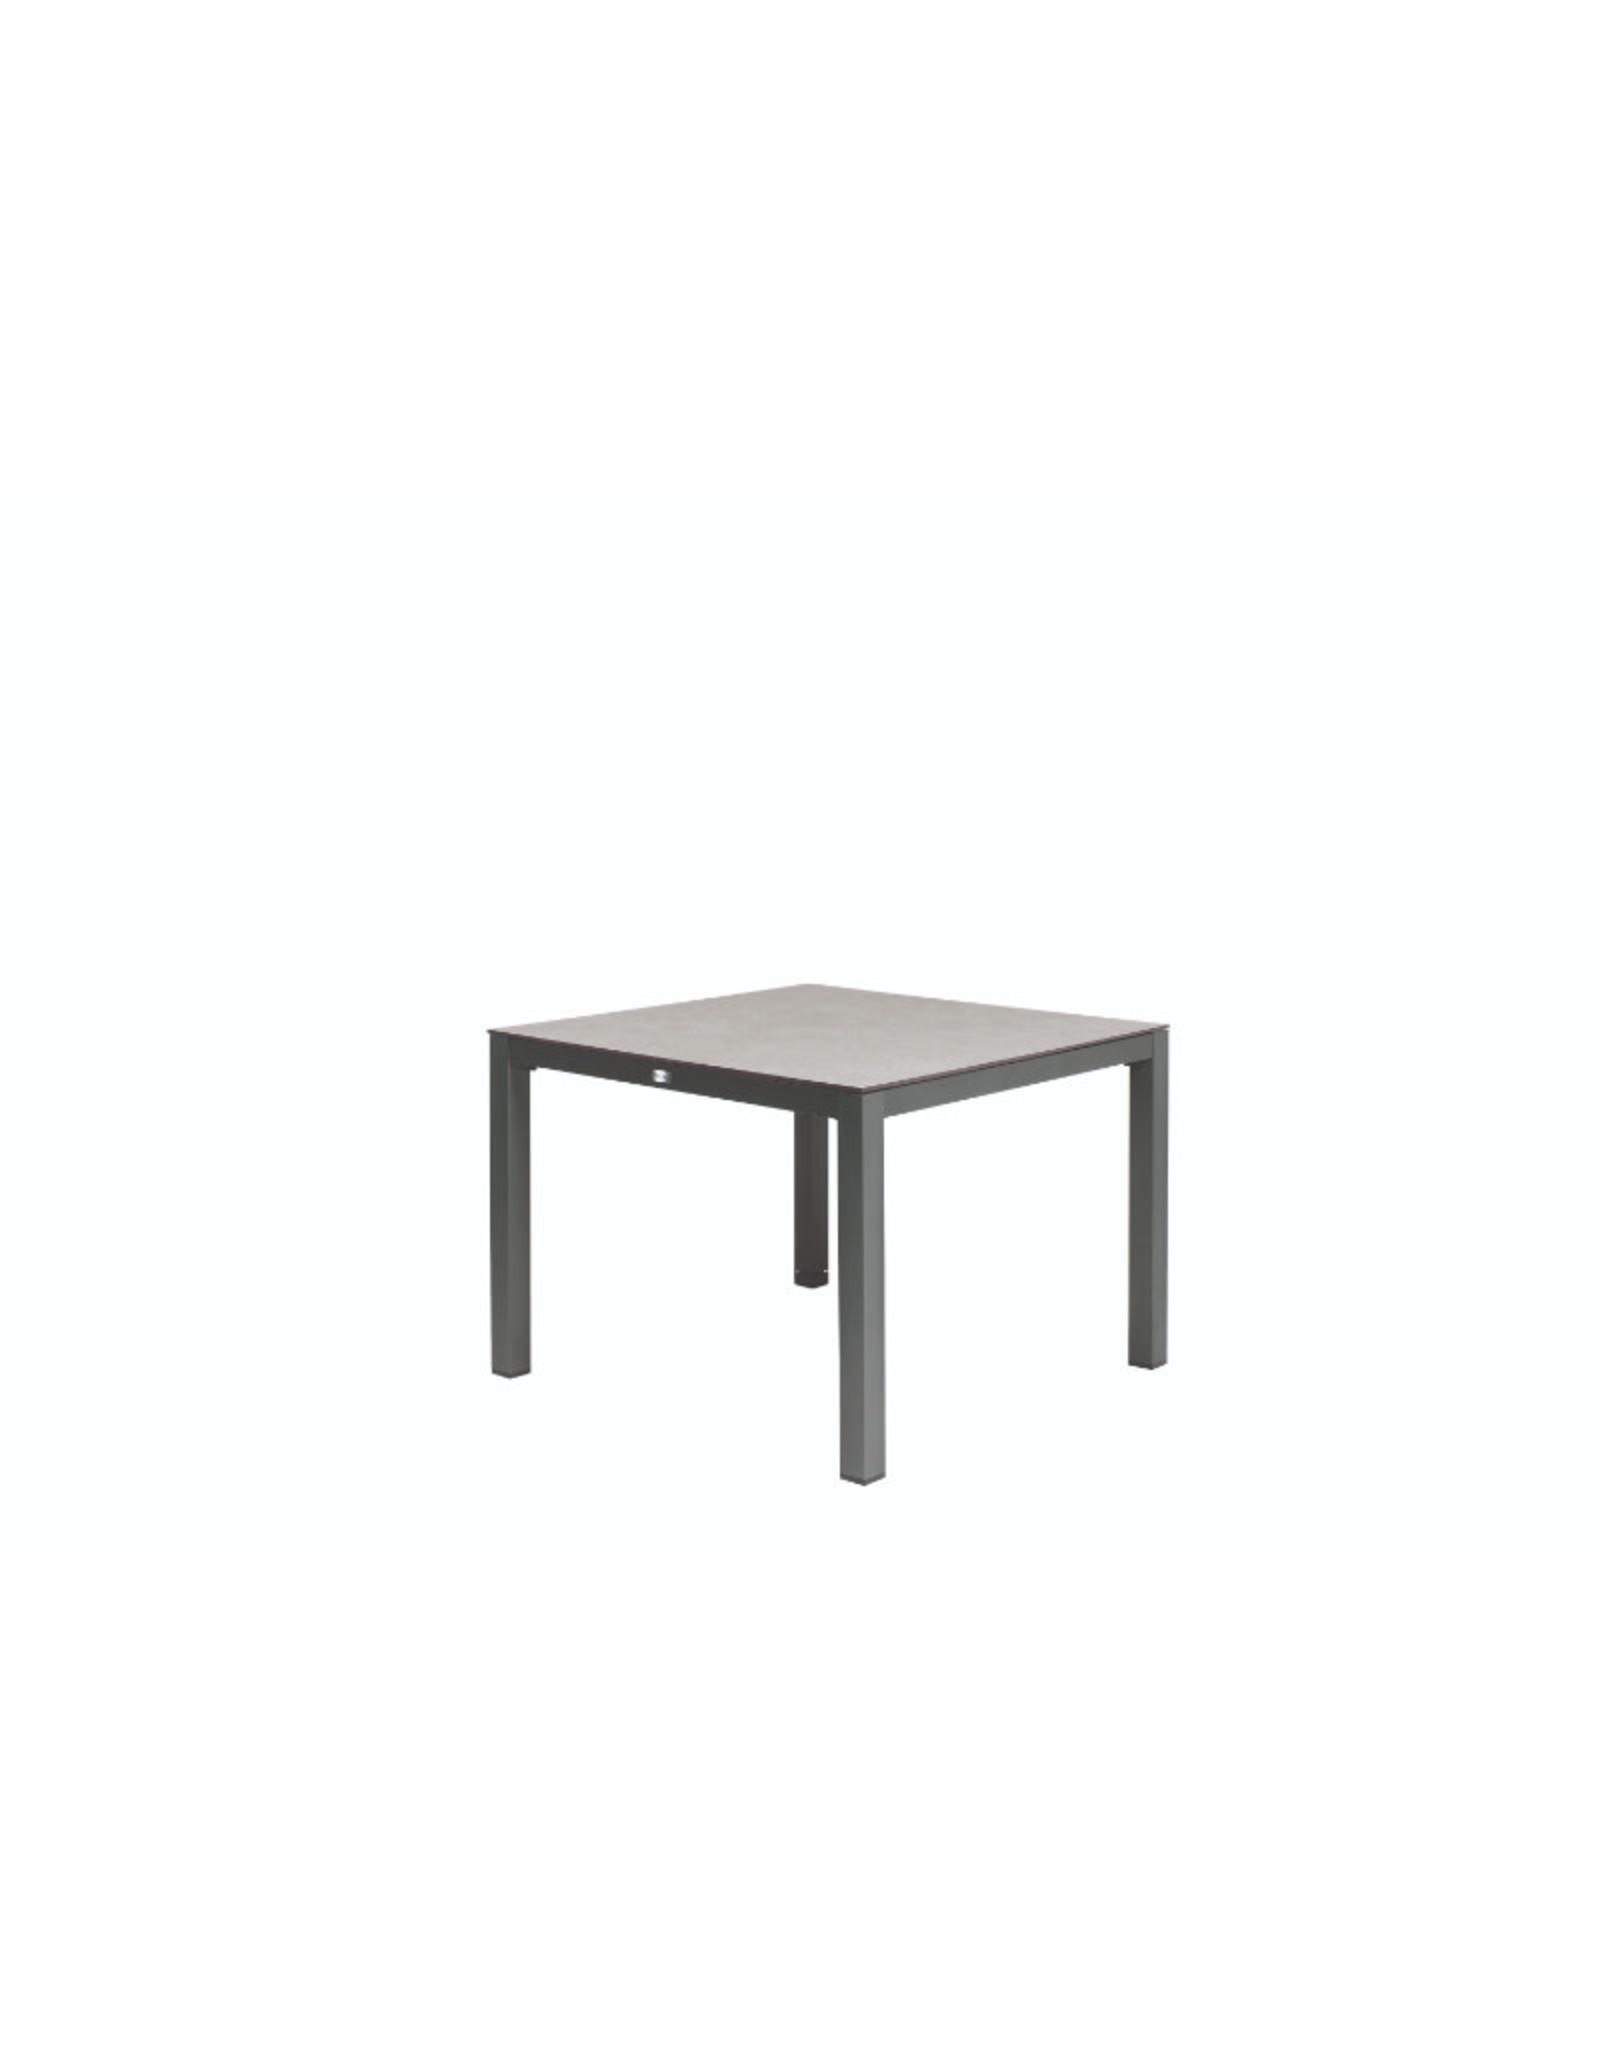 Tierra Outdoor Tierra Outdoor Briga Table Trespa Oak Grey 100x100cm Charcoal Frame